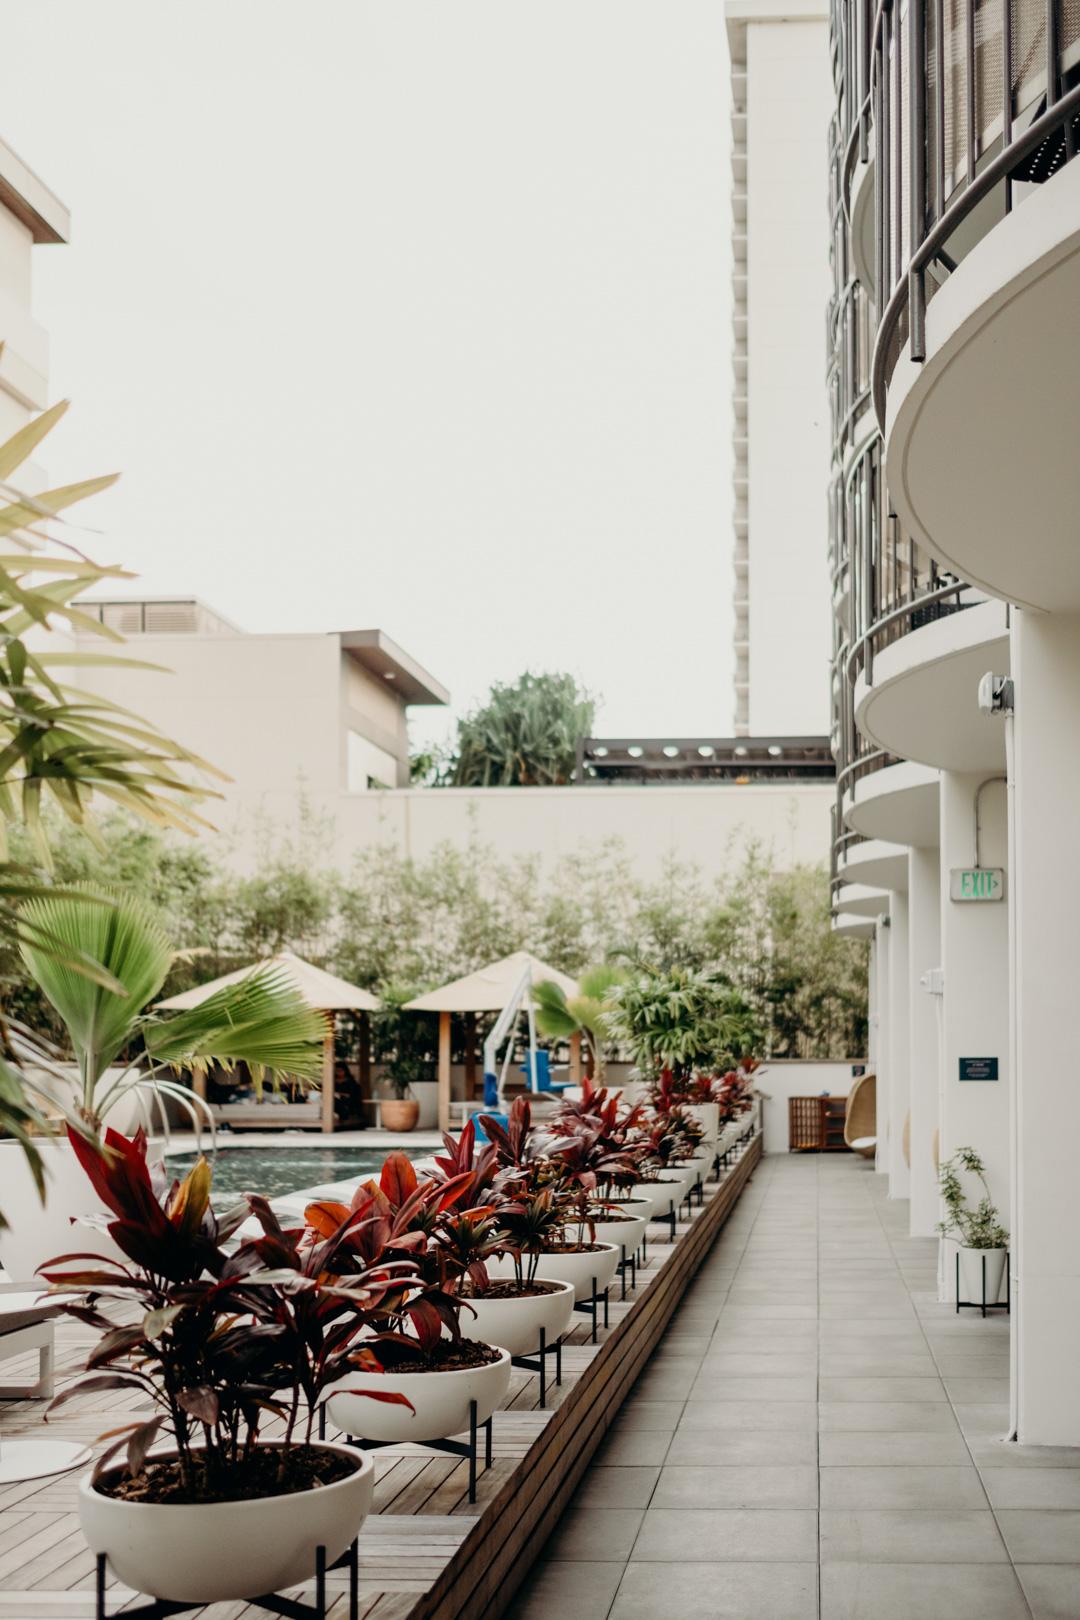 20180416_Visit Hawaii_Honolulu_The Laylow Hotel_7.jpg